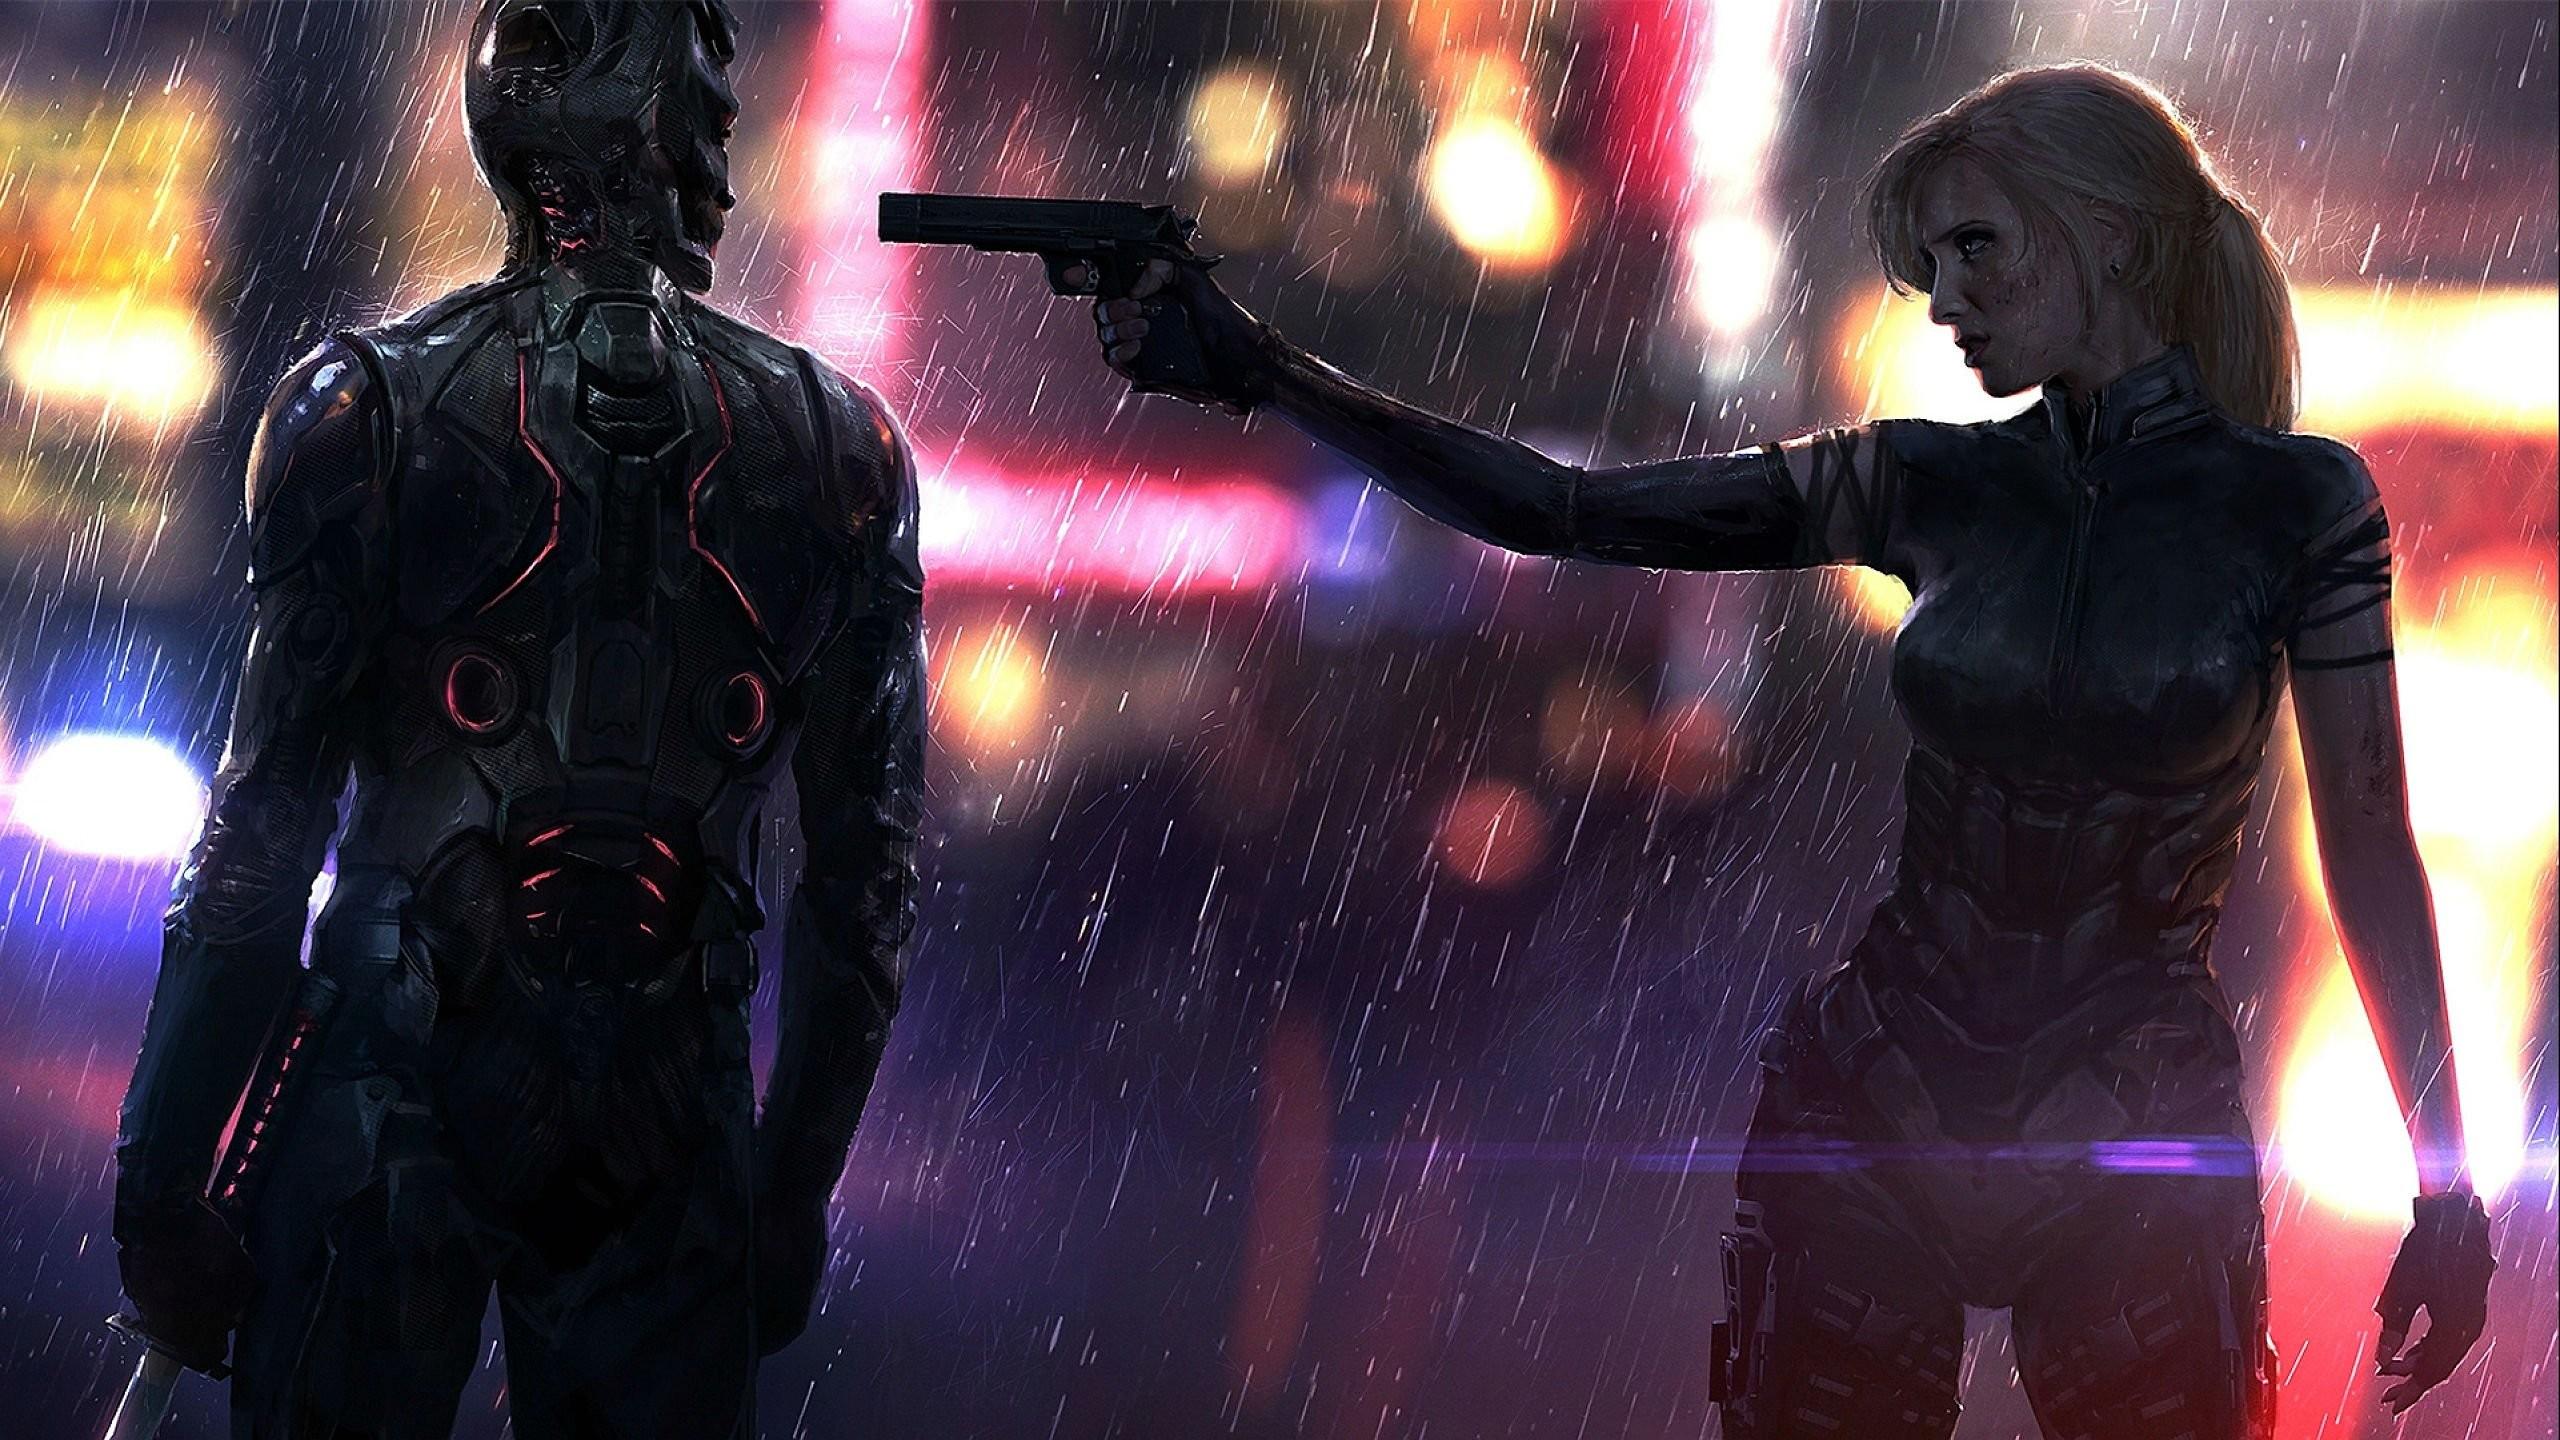 Res: 2560x1440, LAST MAN STANDING comics online killbook bounty hunter 1lmsk action  fighting sci-fi superhero hero heroes warrior adventure girl weapon gun  rain detail ...